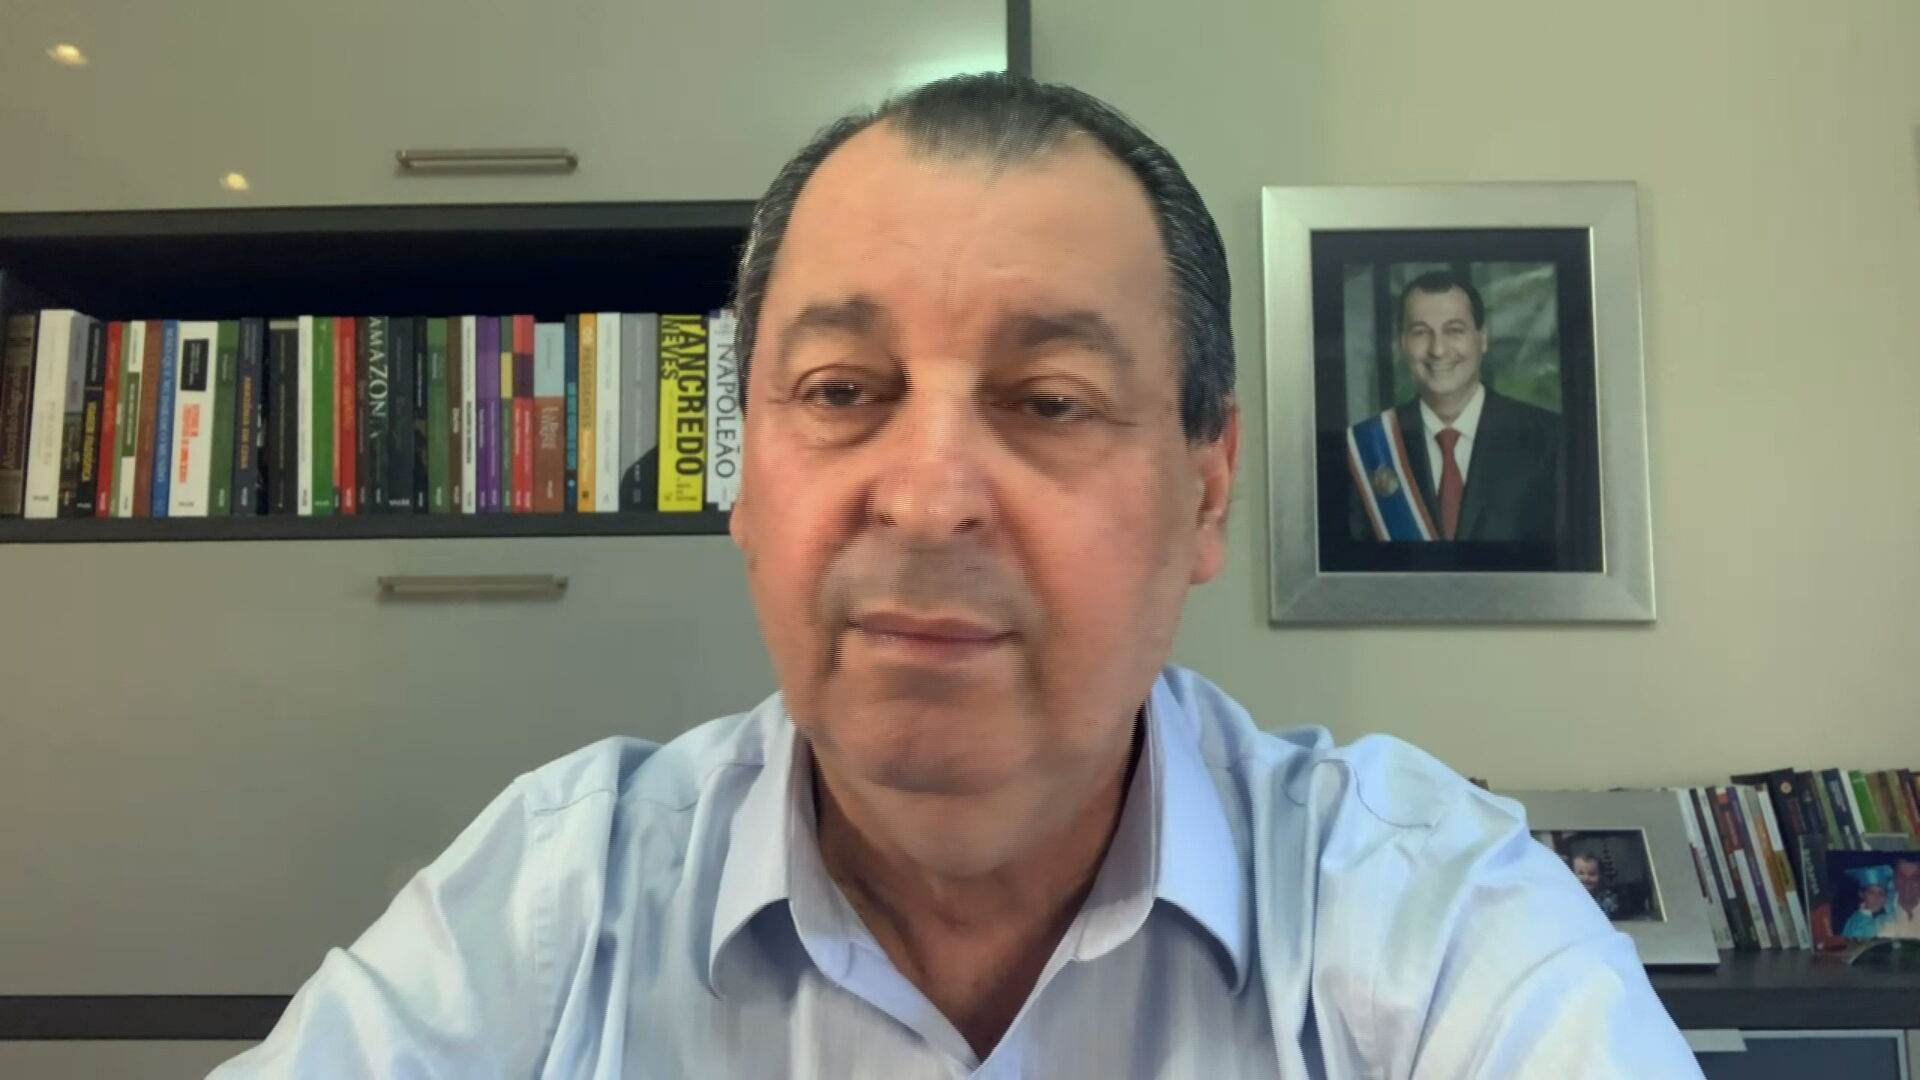 Senador Omar Aziz (PSD-AM), presidente da CPI da Pandemia (18-07-2021)